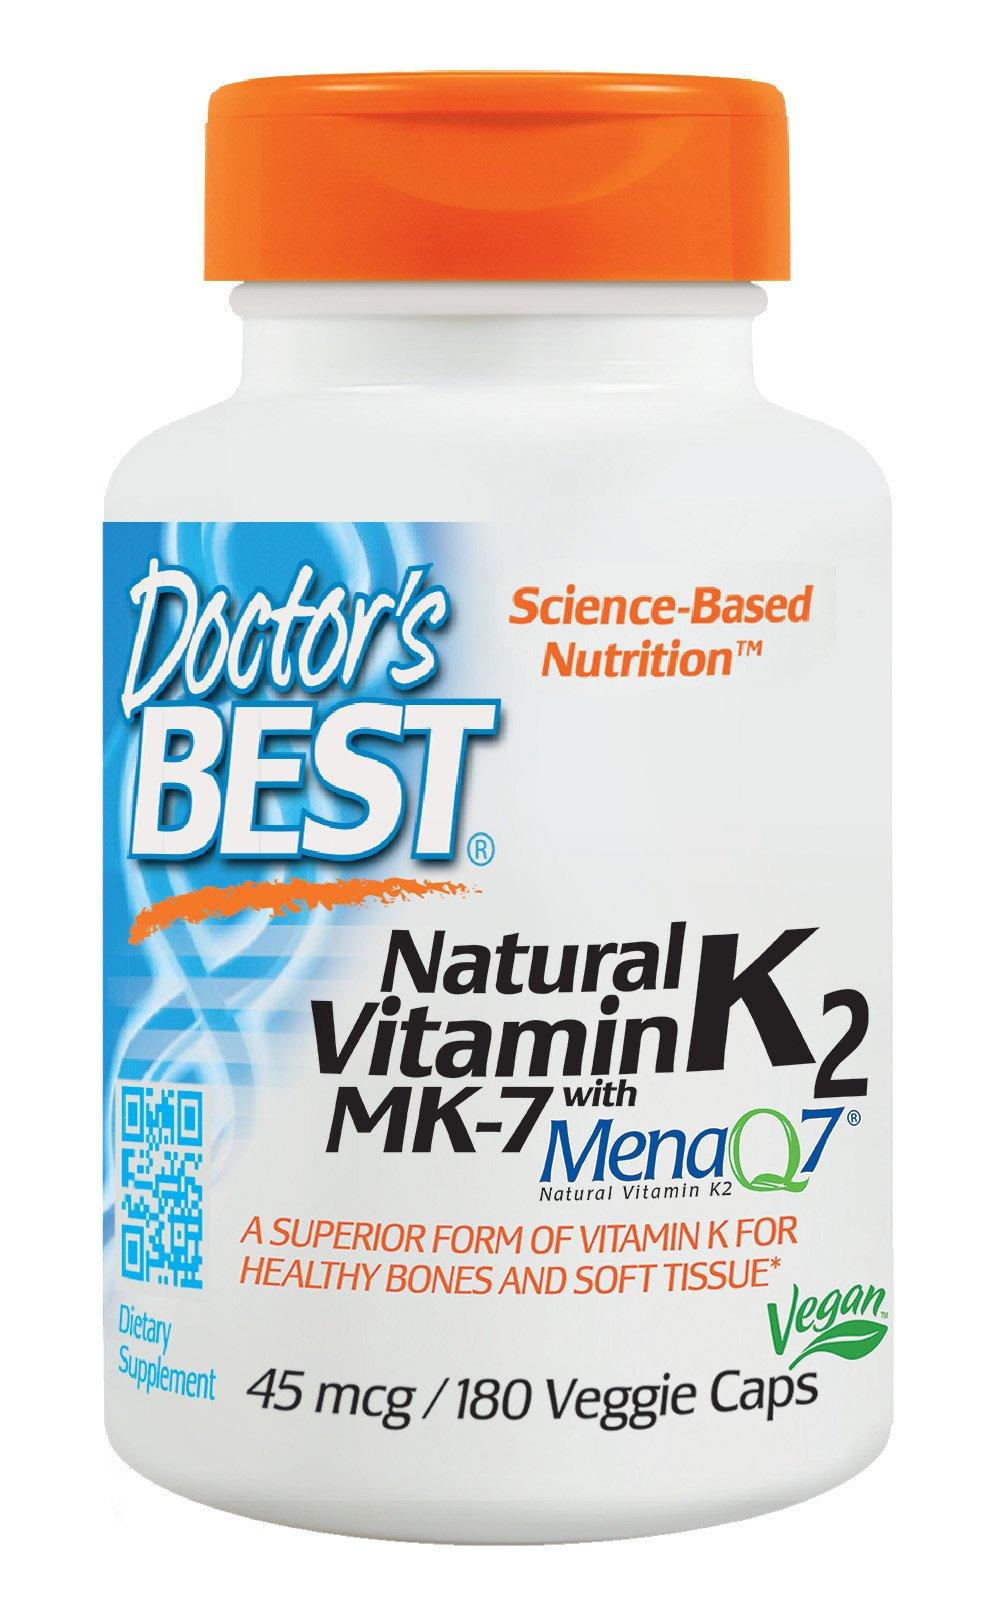 Doctor's Best Natural Vitamin K2 MK-7 with MenaQ7, Non-GMO, Vegan, Gluten Free, Soy Free, 45 mcg, 180 Veggie Caps